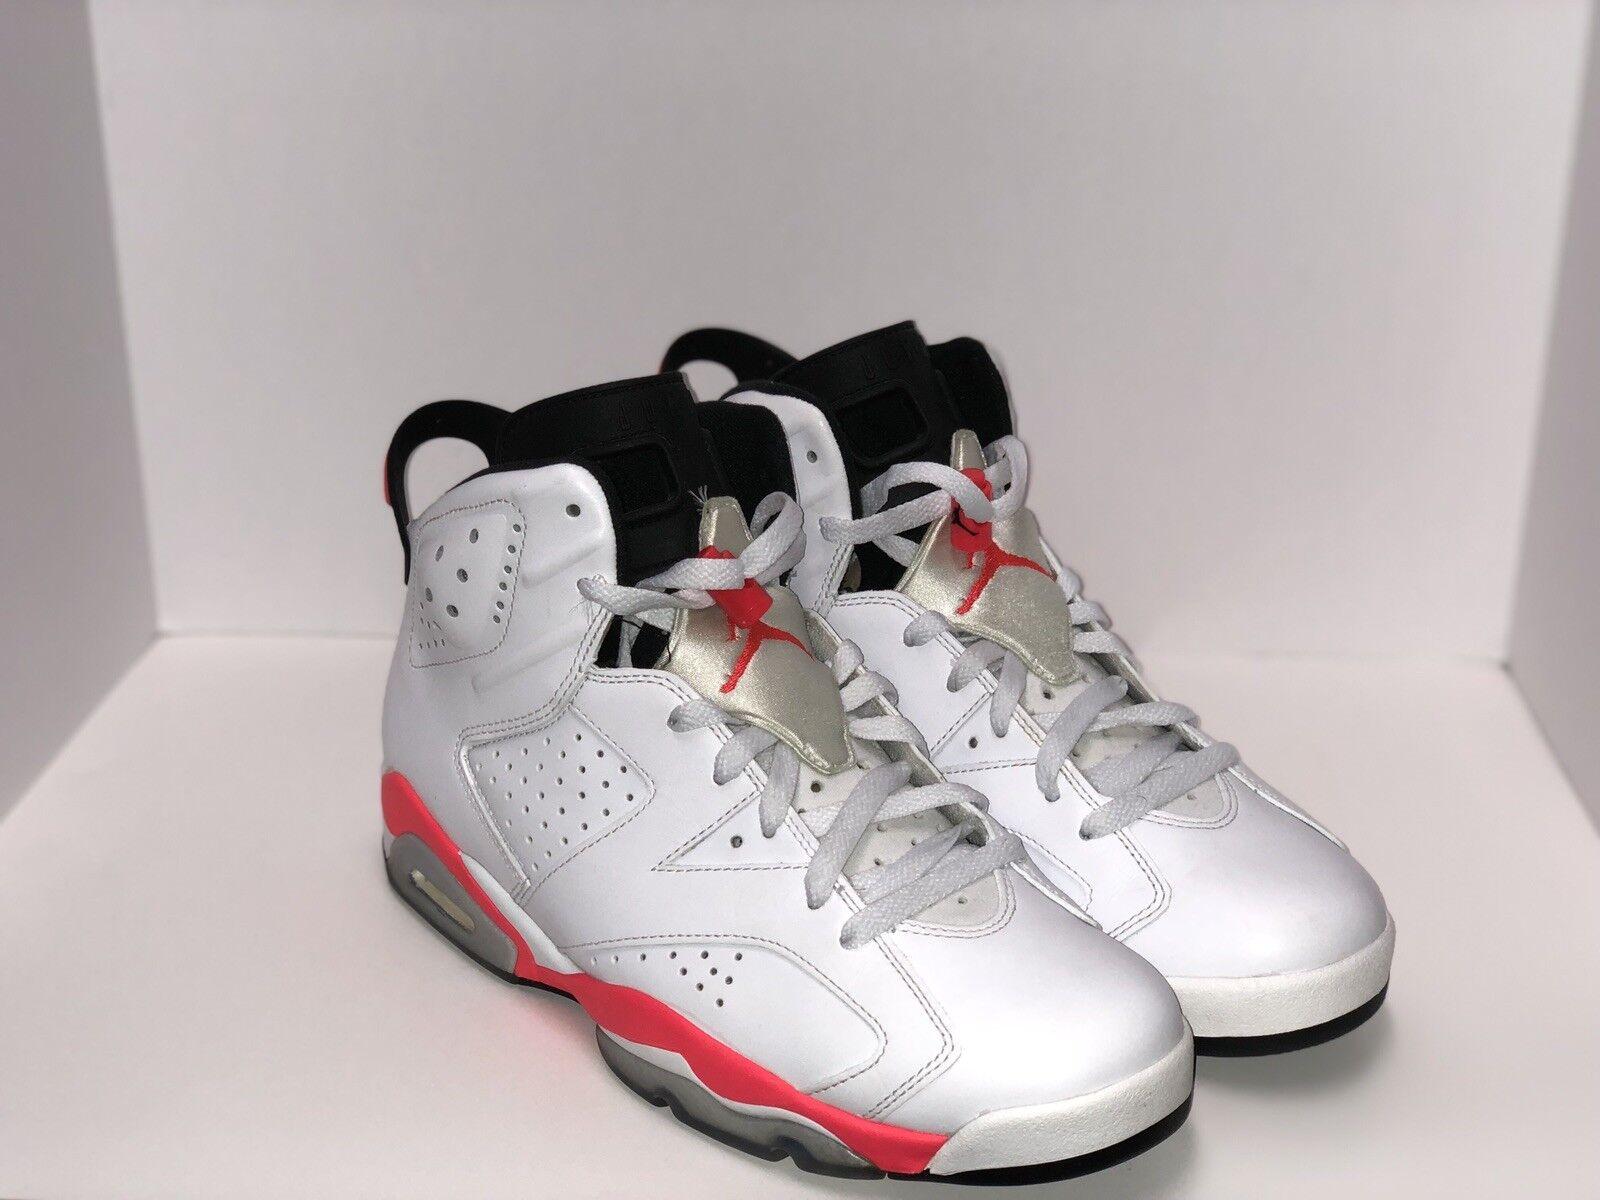 new product 3212a 1f9db Nike Air Jordan 6 Retro VI VI VI White Infrared Sz. 9.5 384664-123